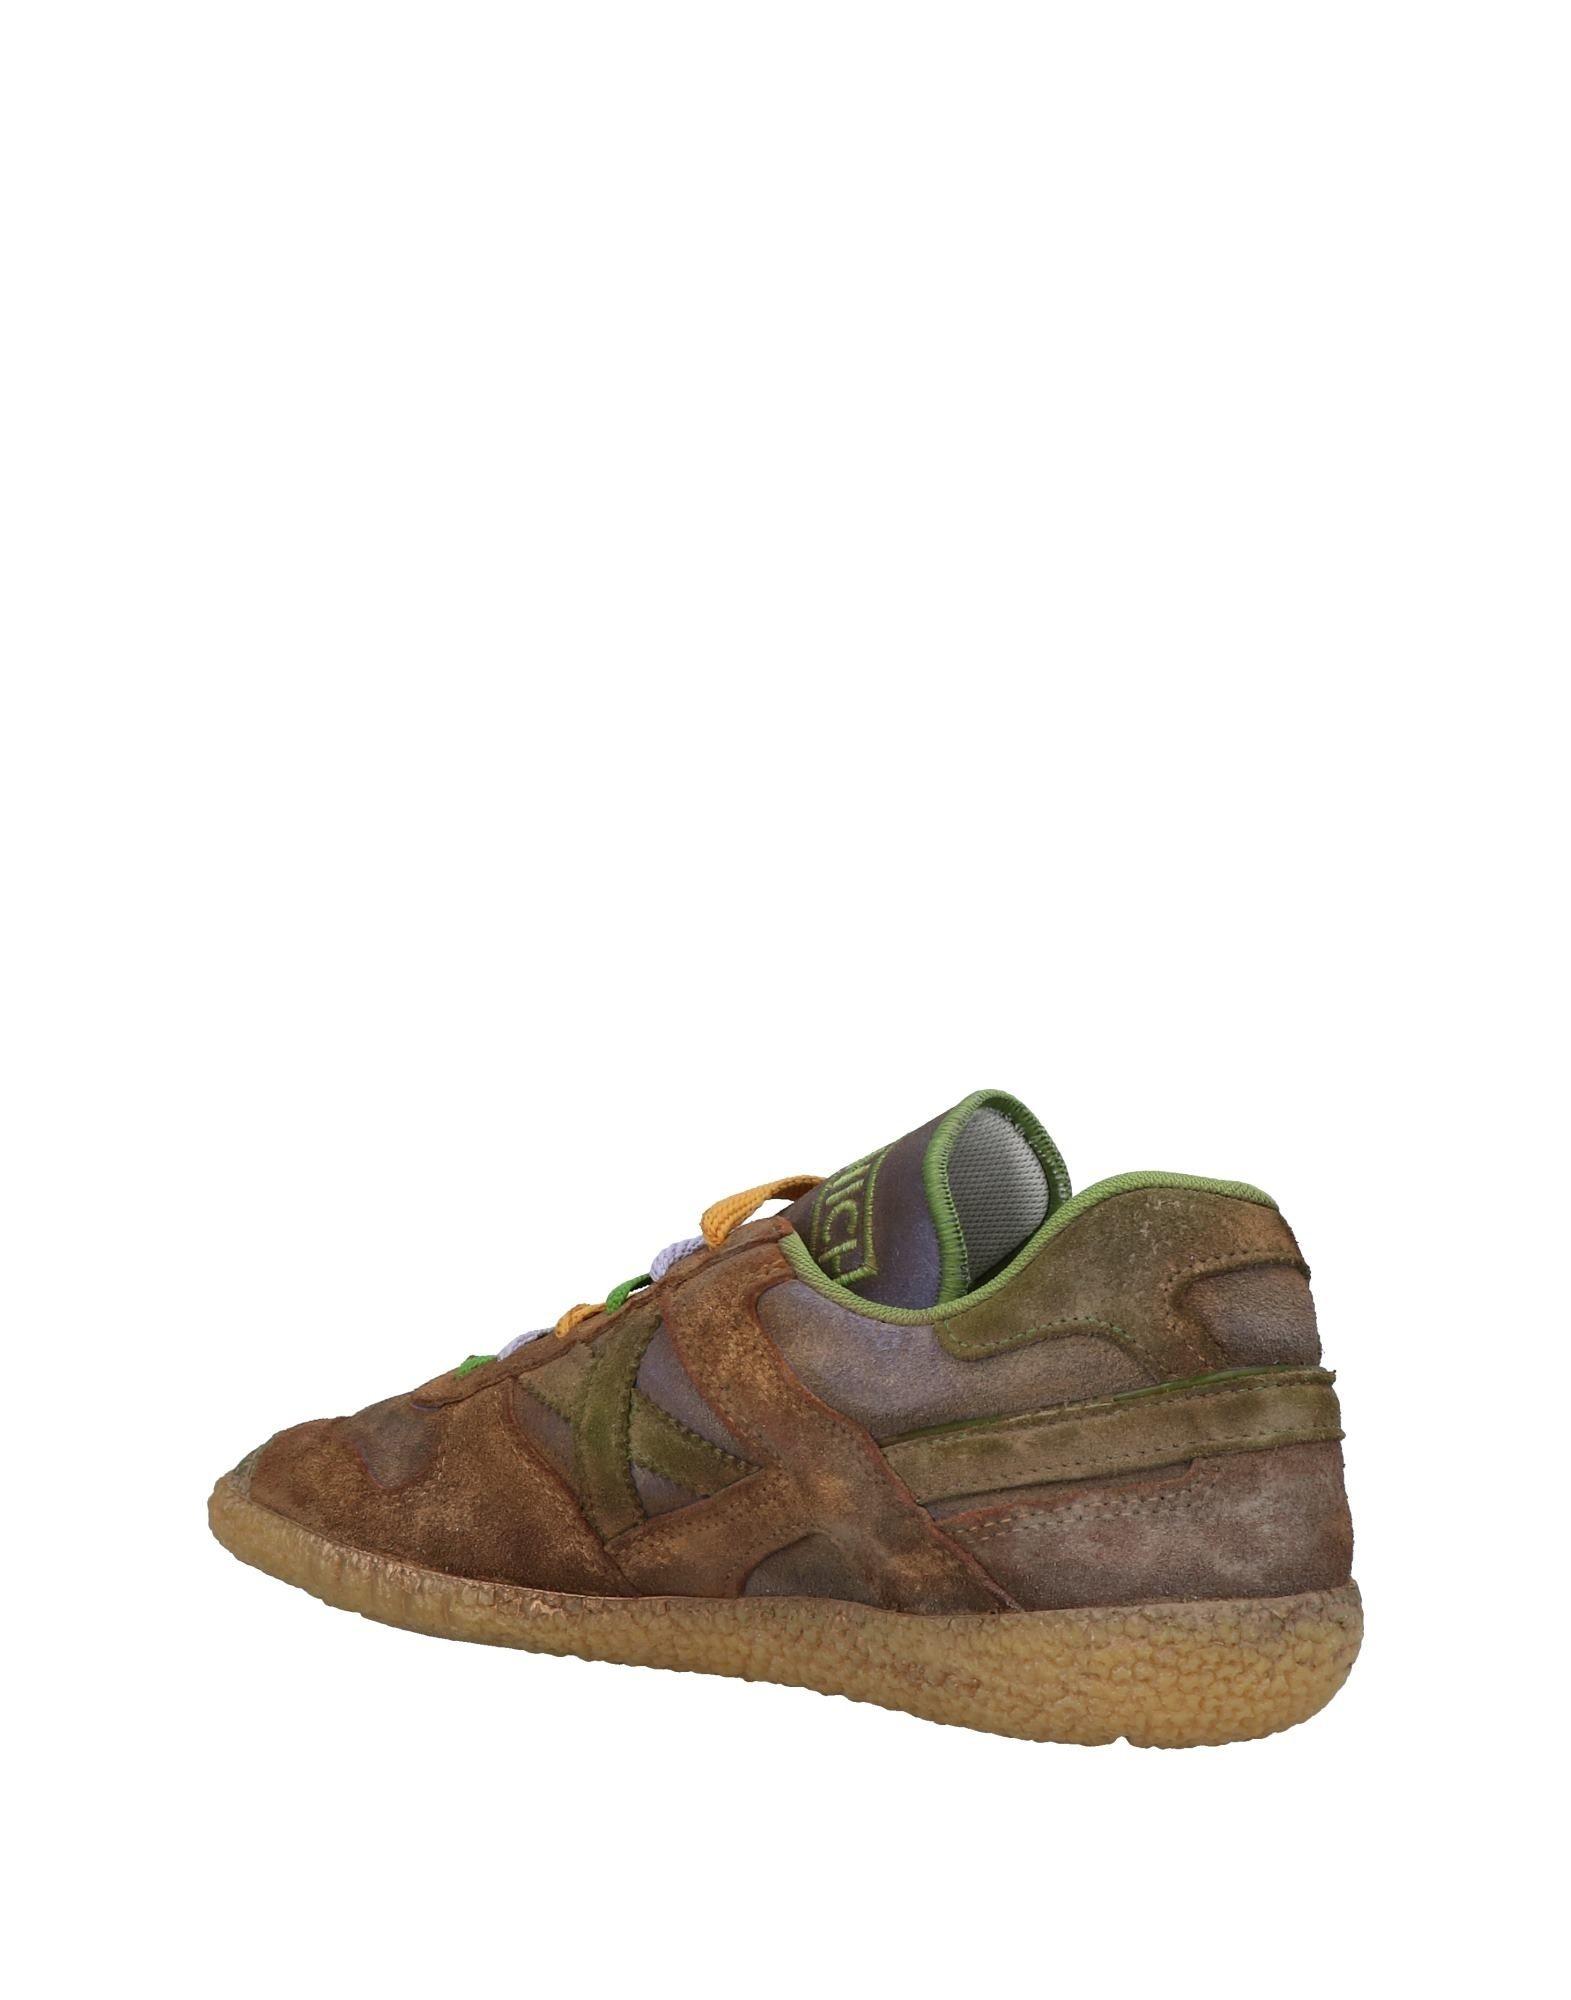 Rabatt echte Schuhe Herren Munich Sneakers Herren Schuhe  11454719LV b85c8b